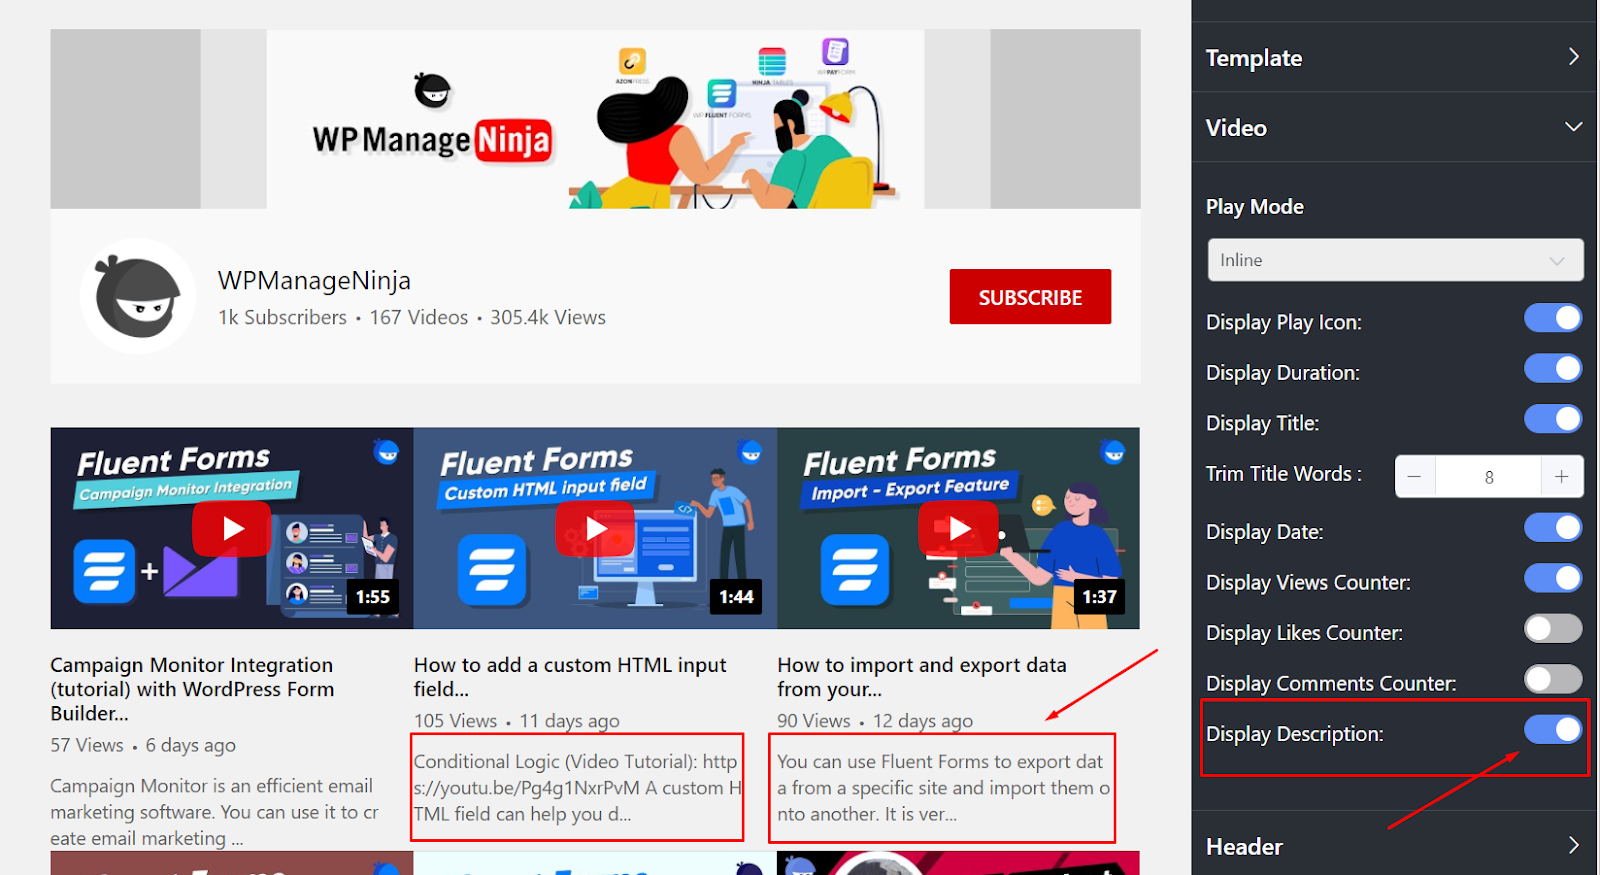 youtube settings display description